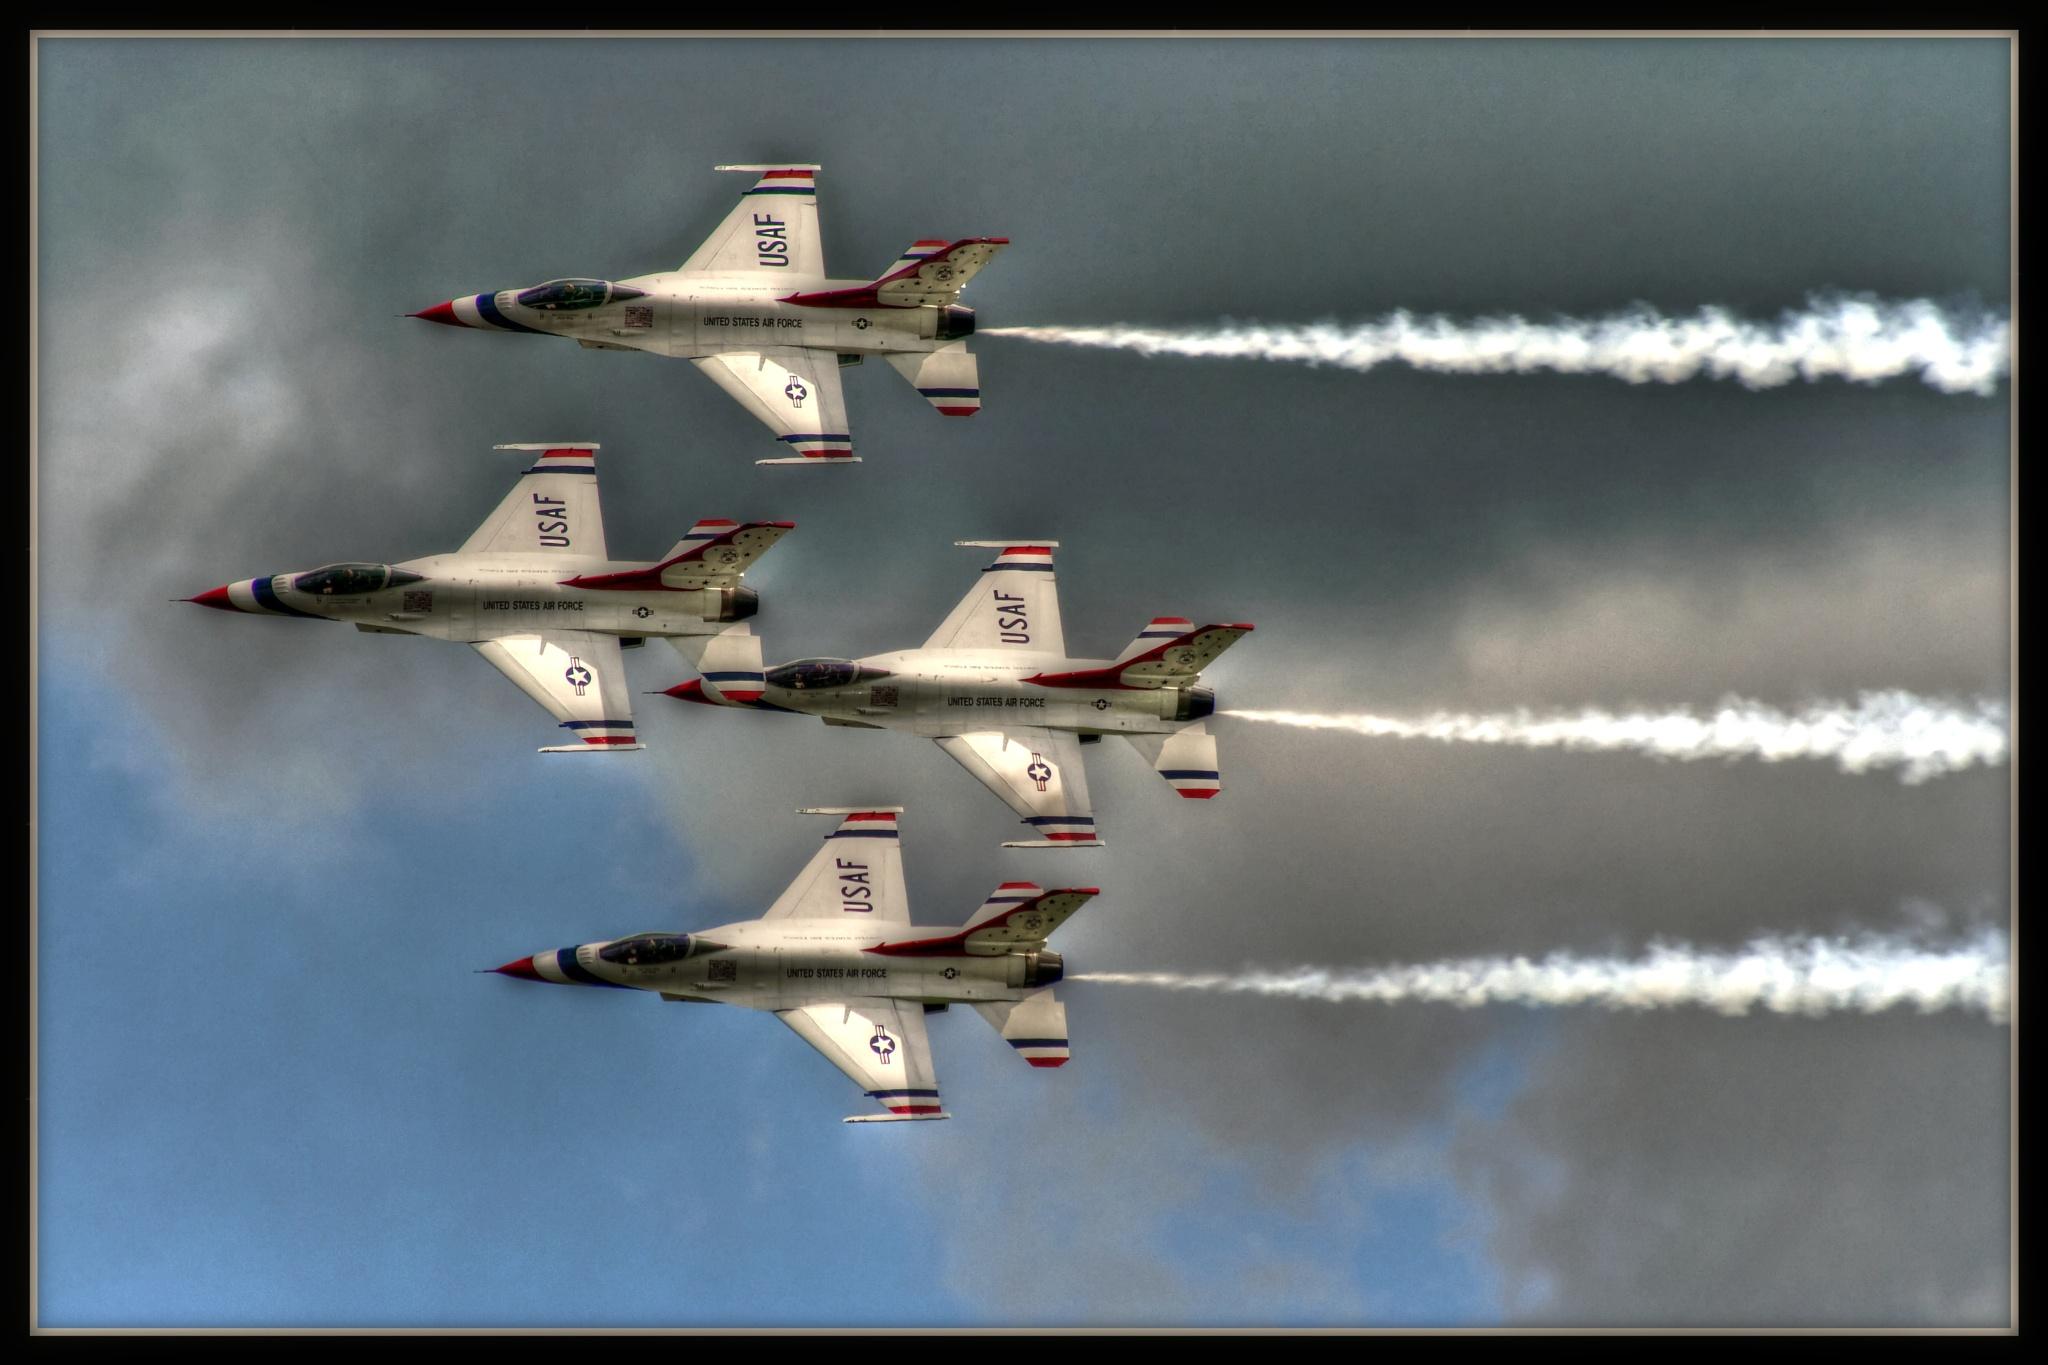 USAF Thunderbirds by JR's Photography